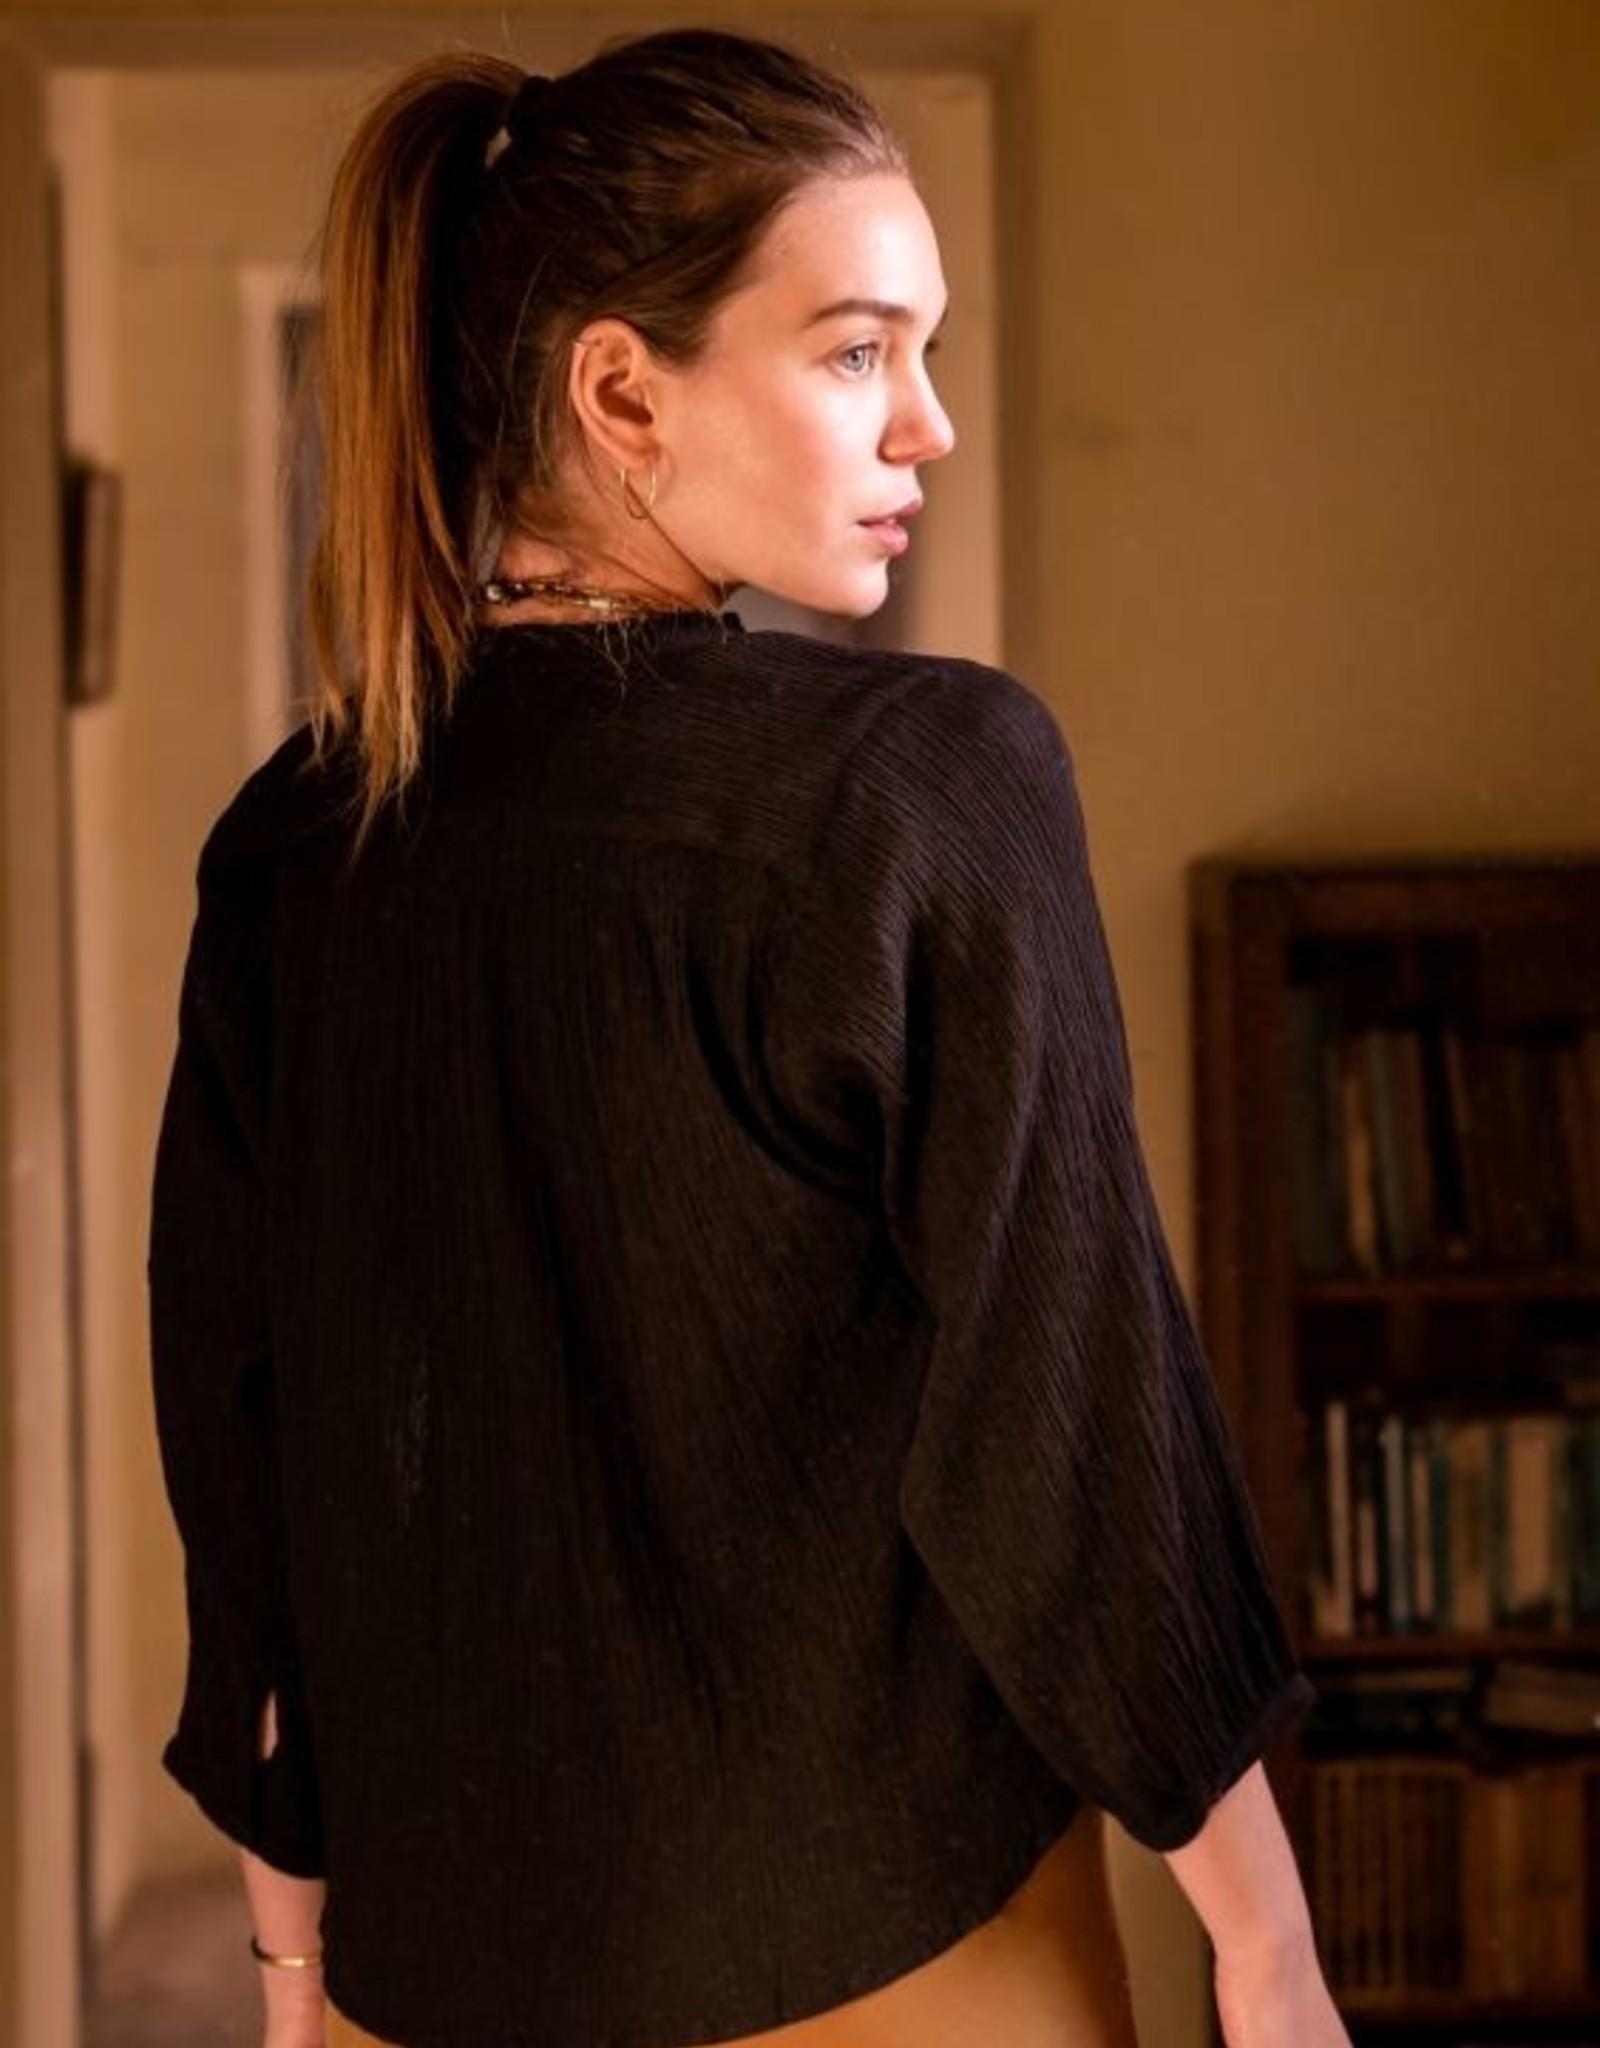 La Petite Etoile Blouse 'Amor' Zwart